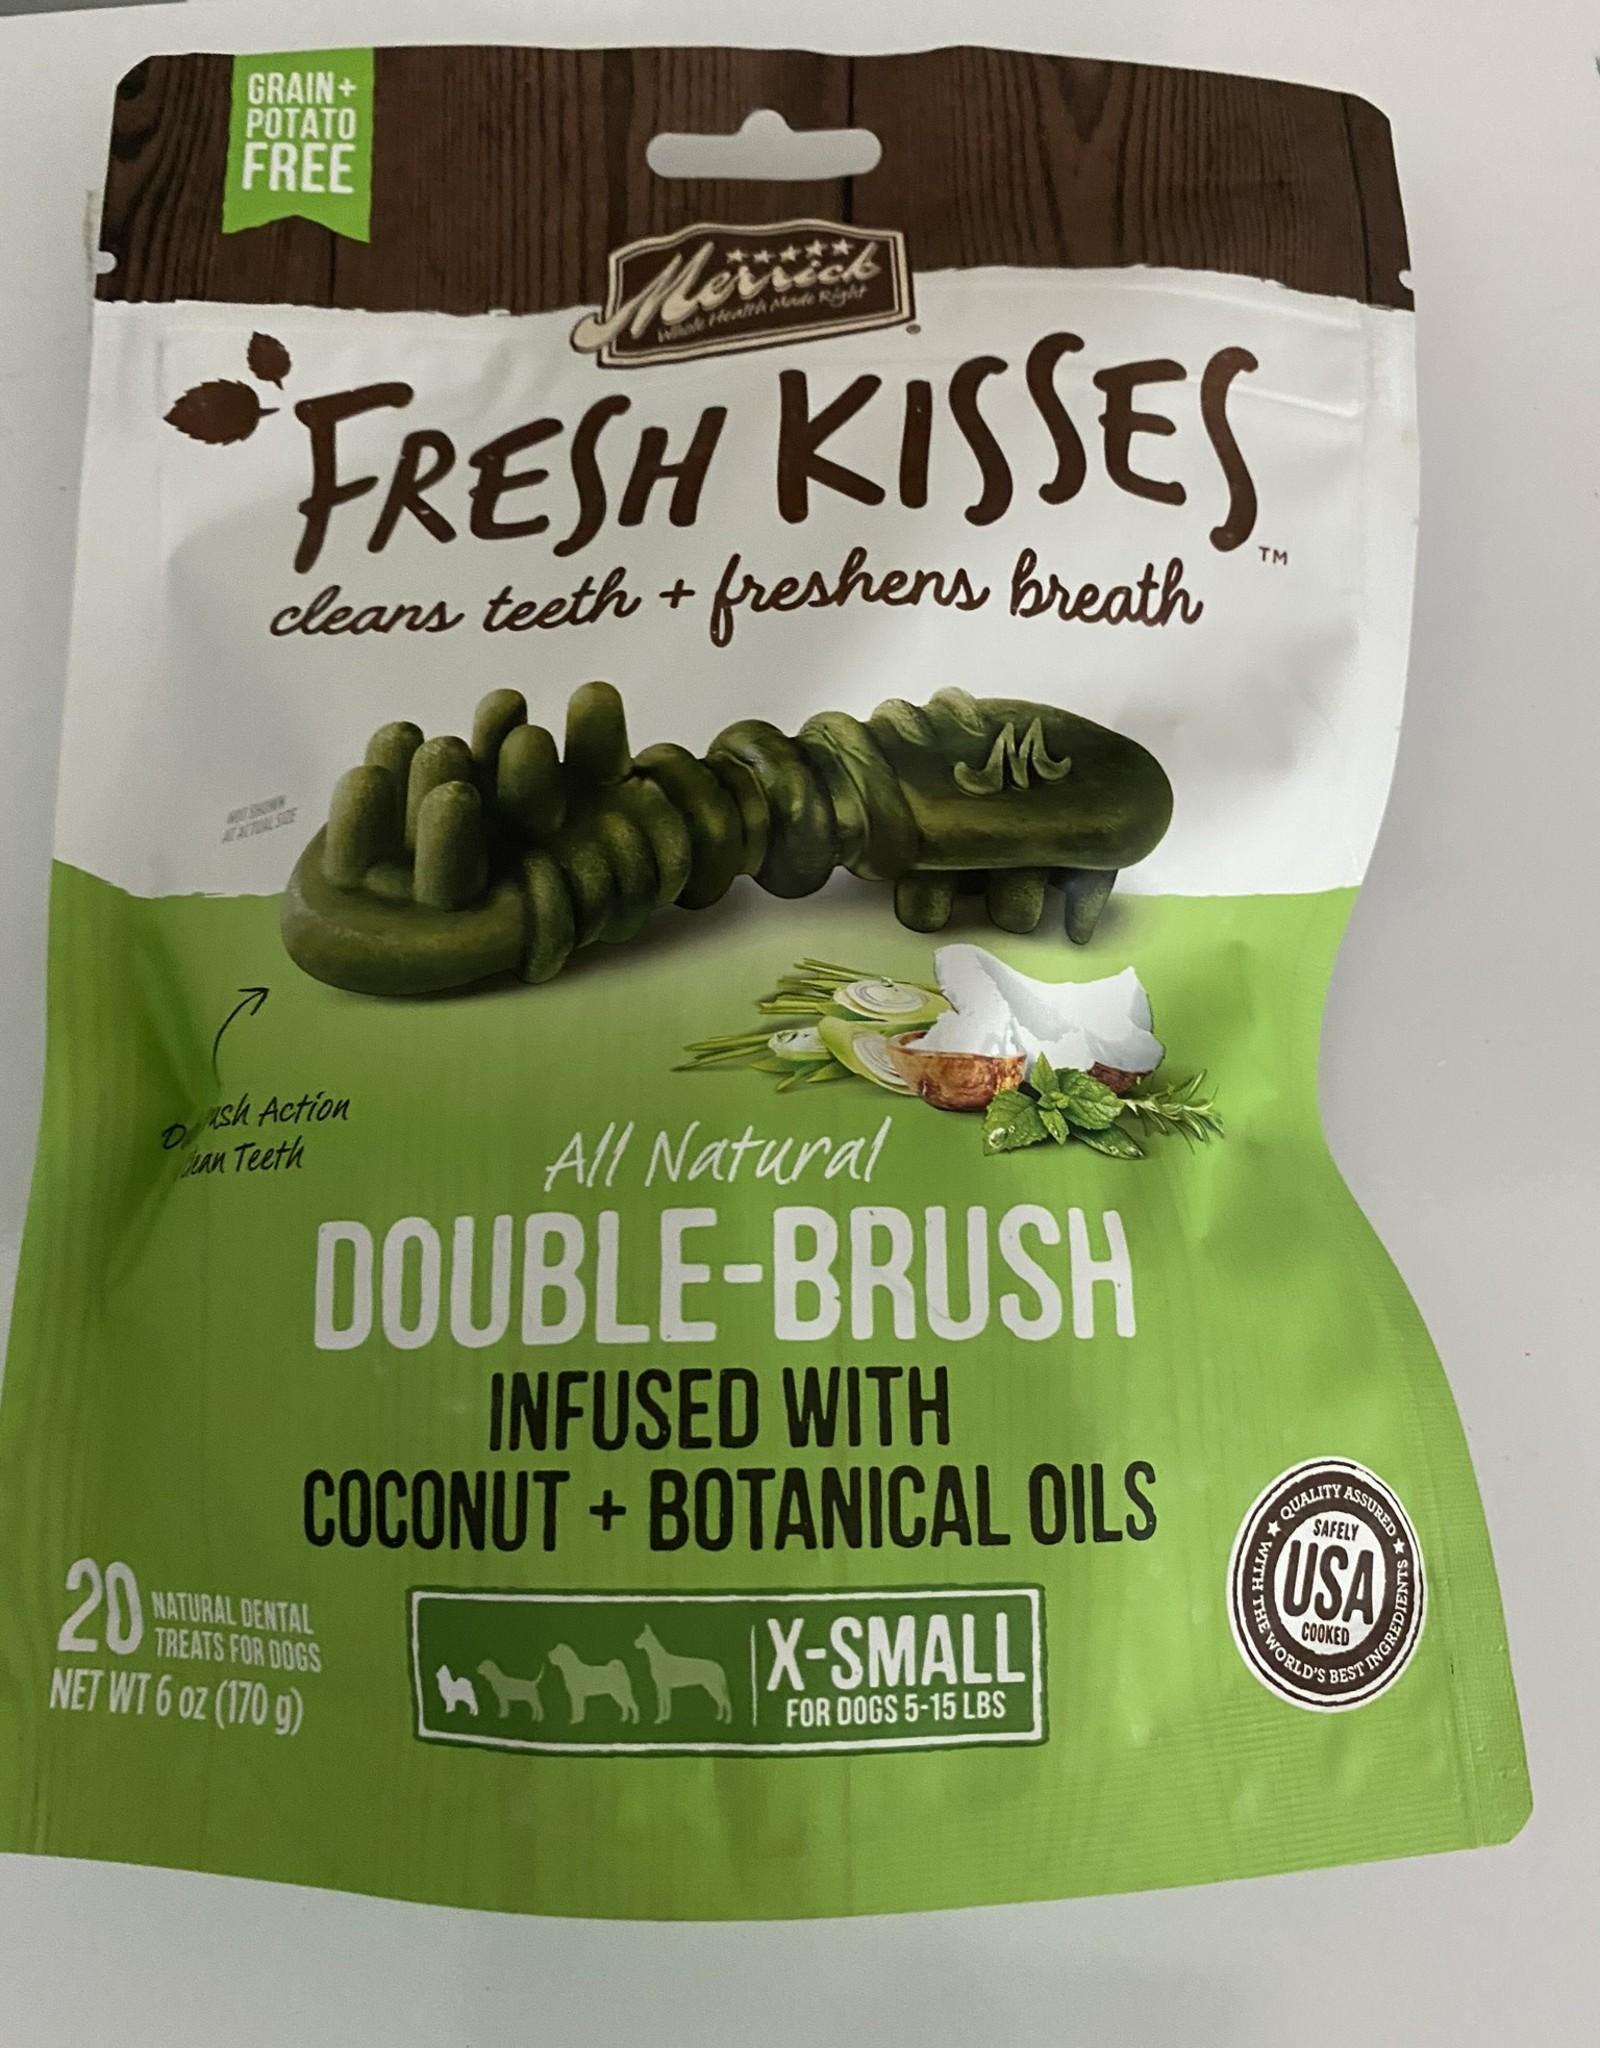 Merrick Fresh Kisses Xsmall Coconut